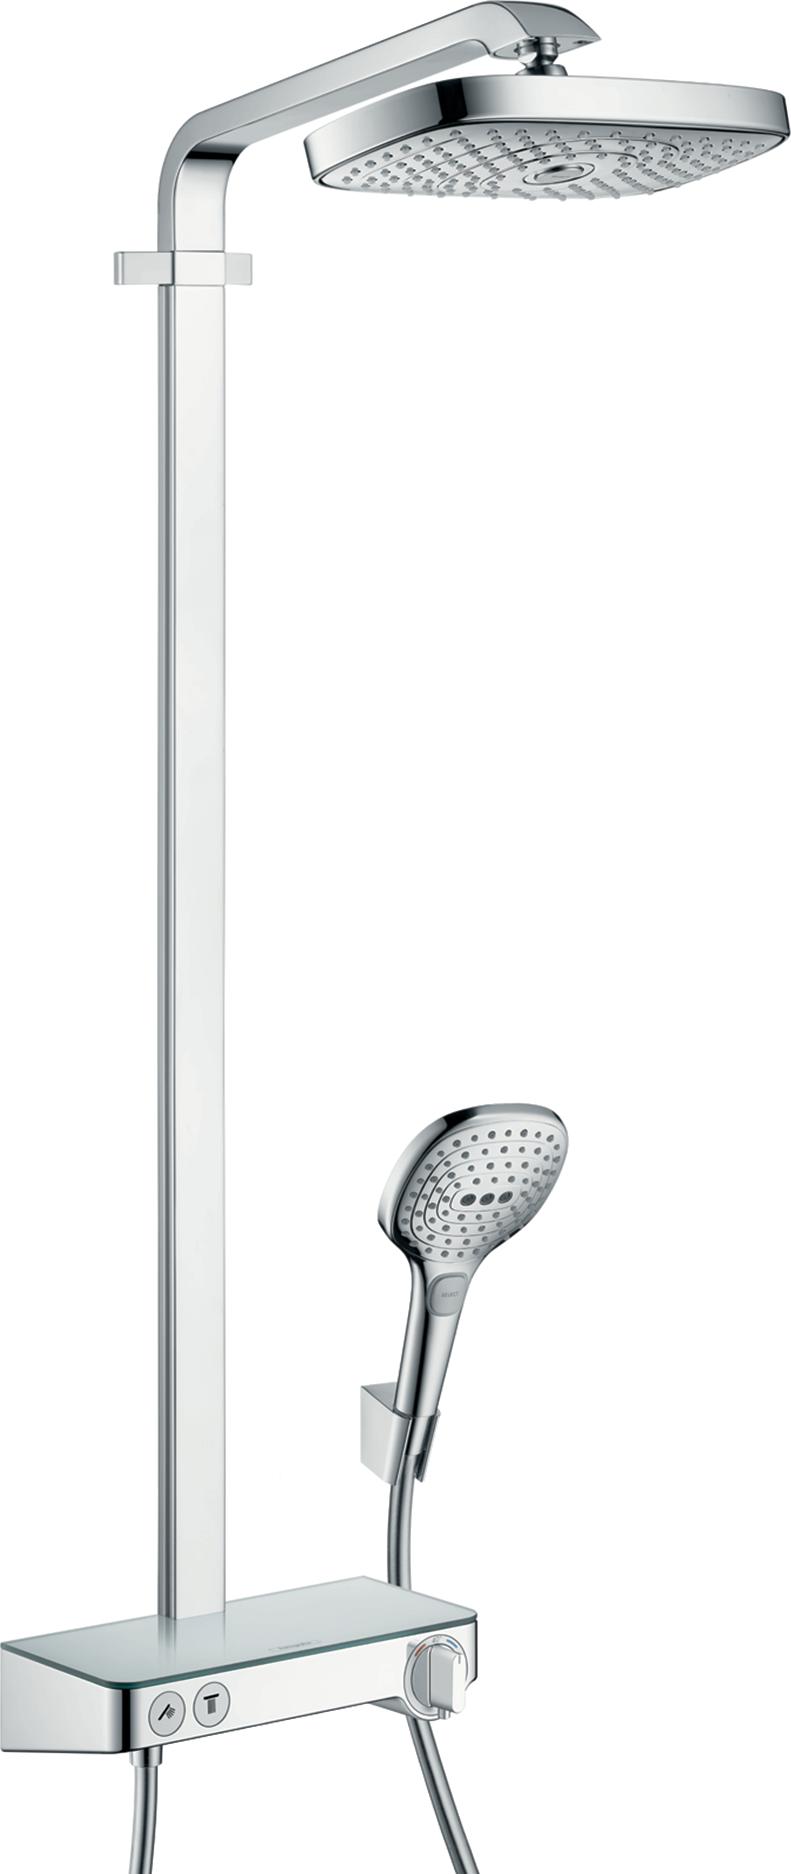 Душевая система hansgrohe Raindance Select E 300 2jet Showerpipe с термостатом, хром 27126000